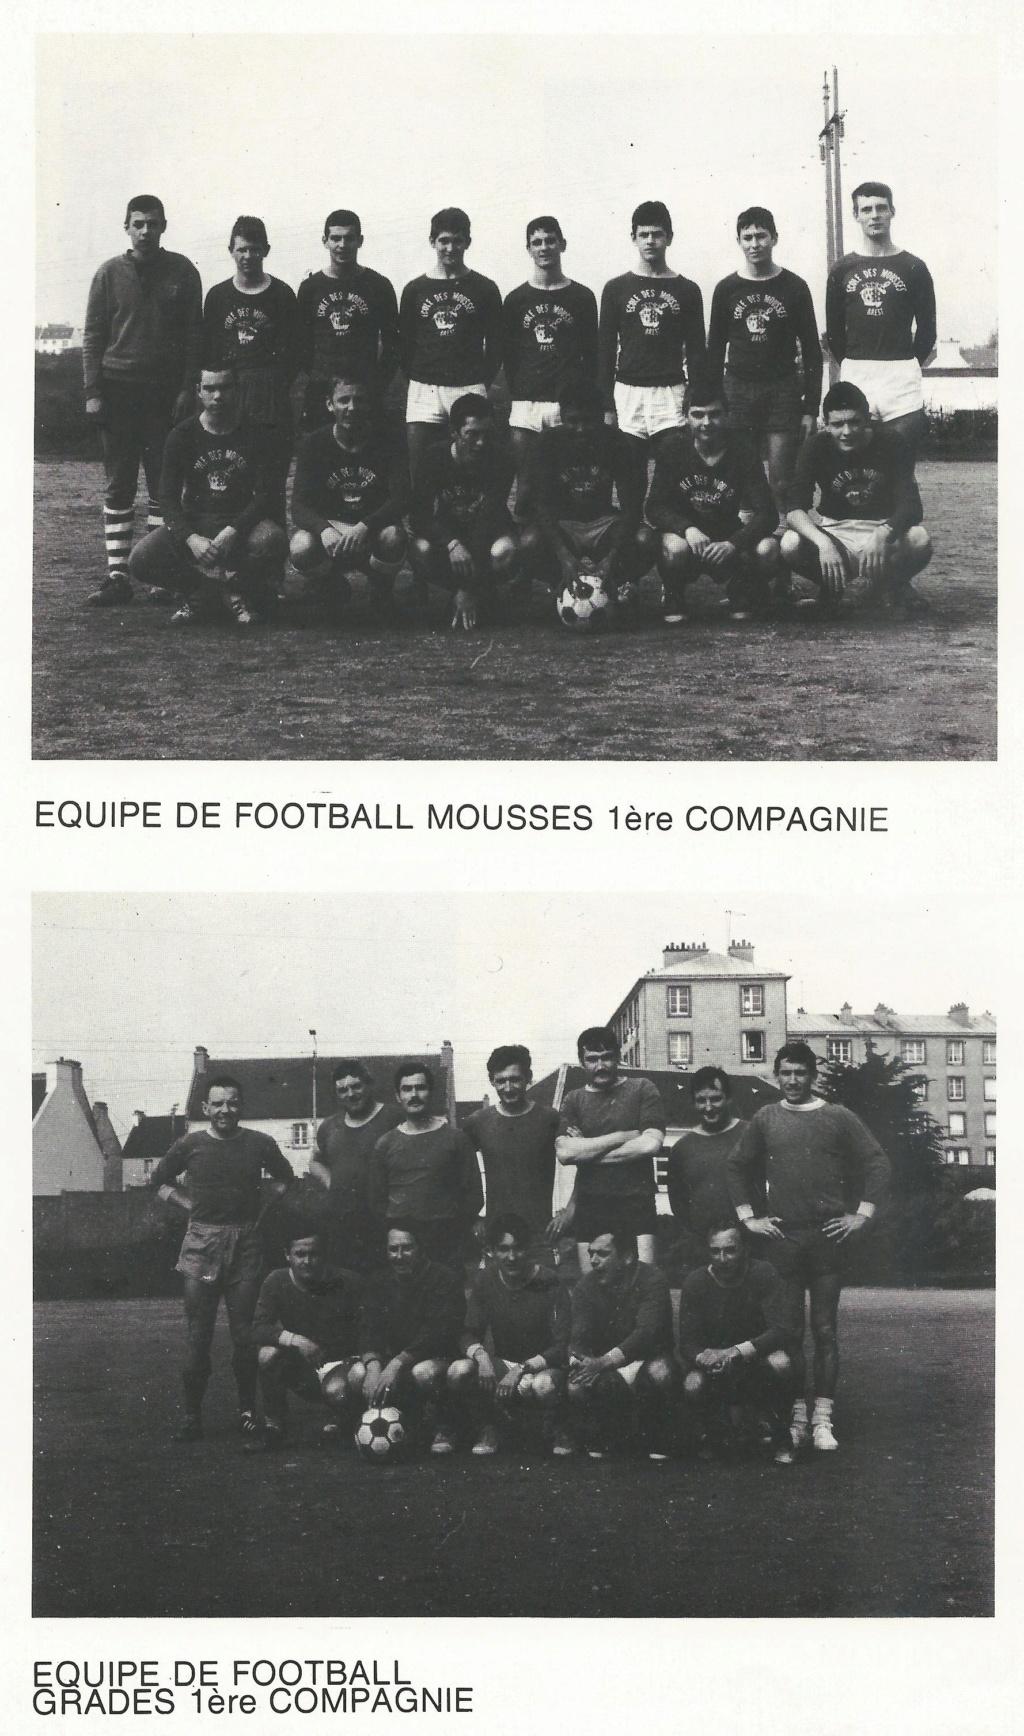 [ École des Mousses ] École des mousses 76/77 Mousse25